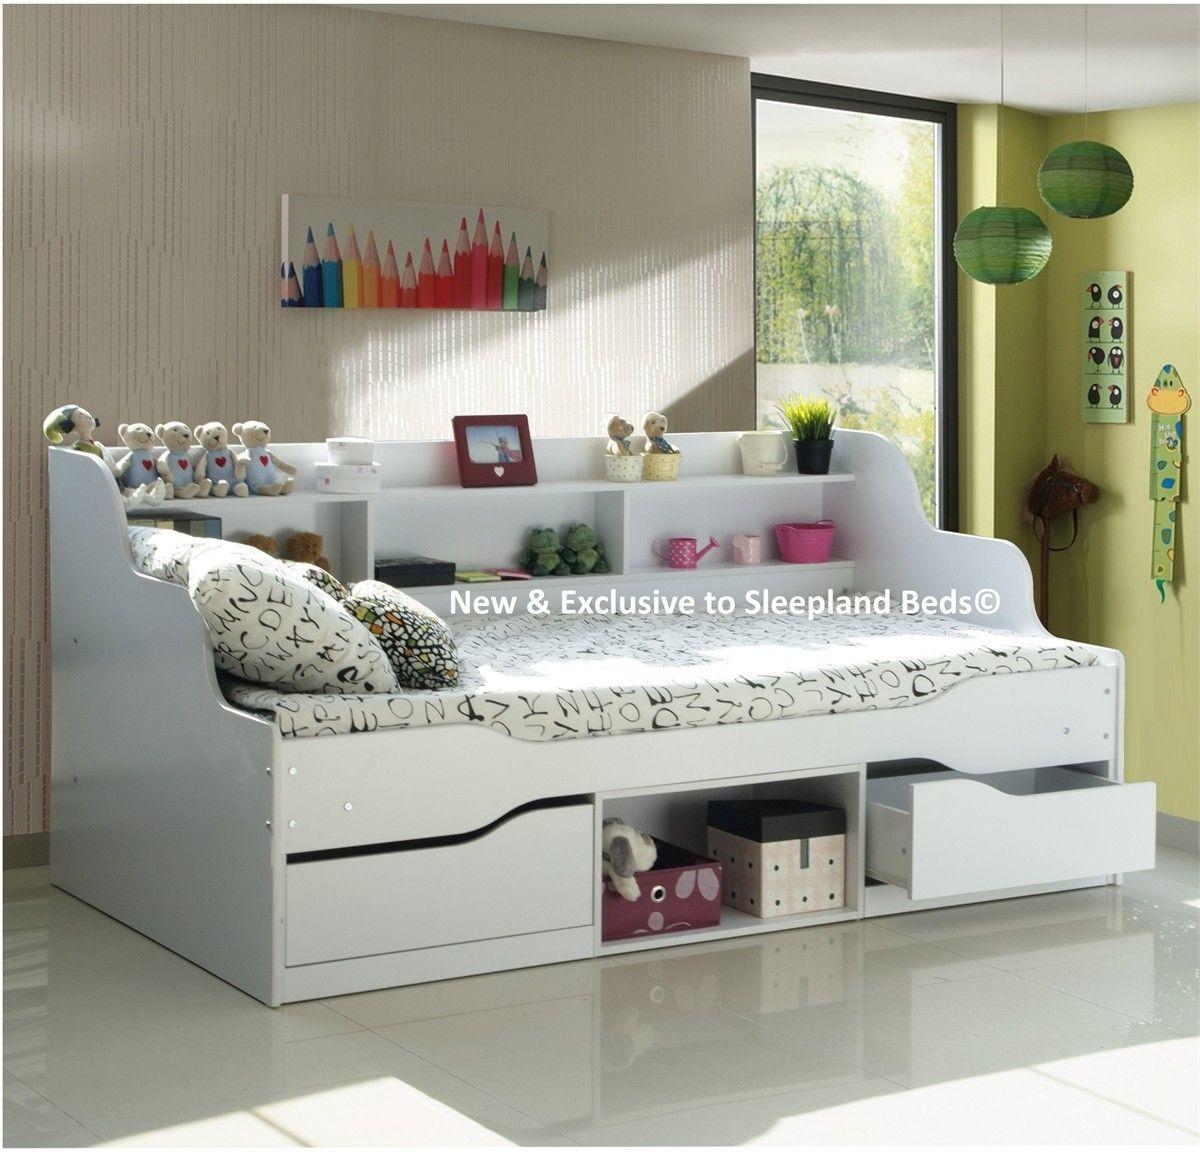 almeria single white bed frame - White Bed Frame With Storage